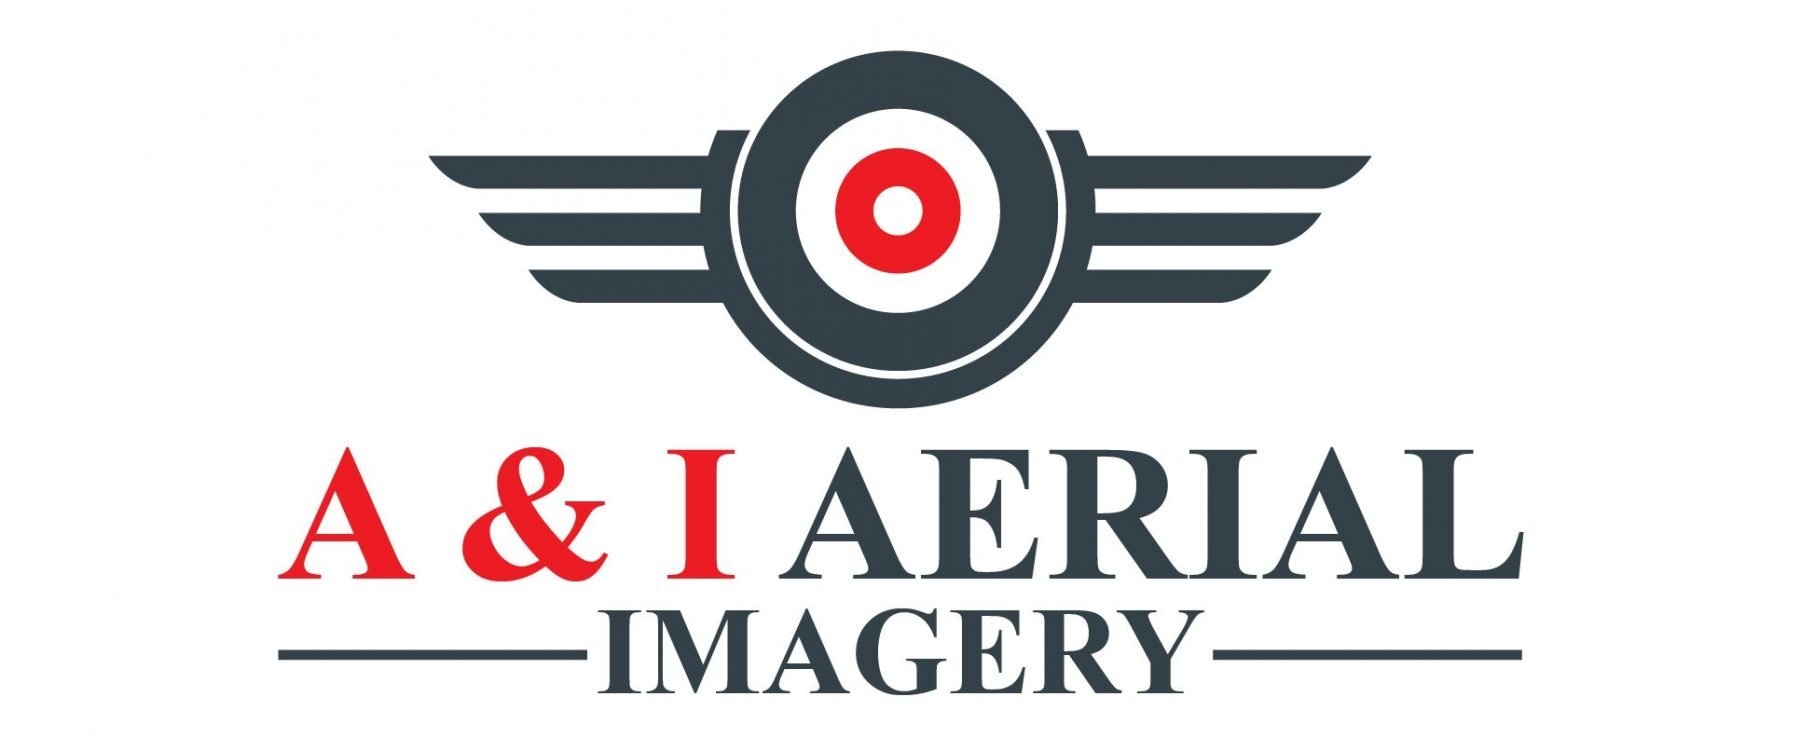 A&I Aerial Imagery